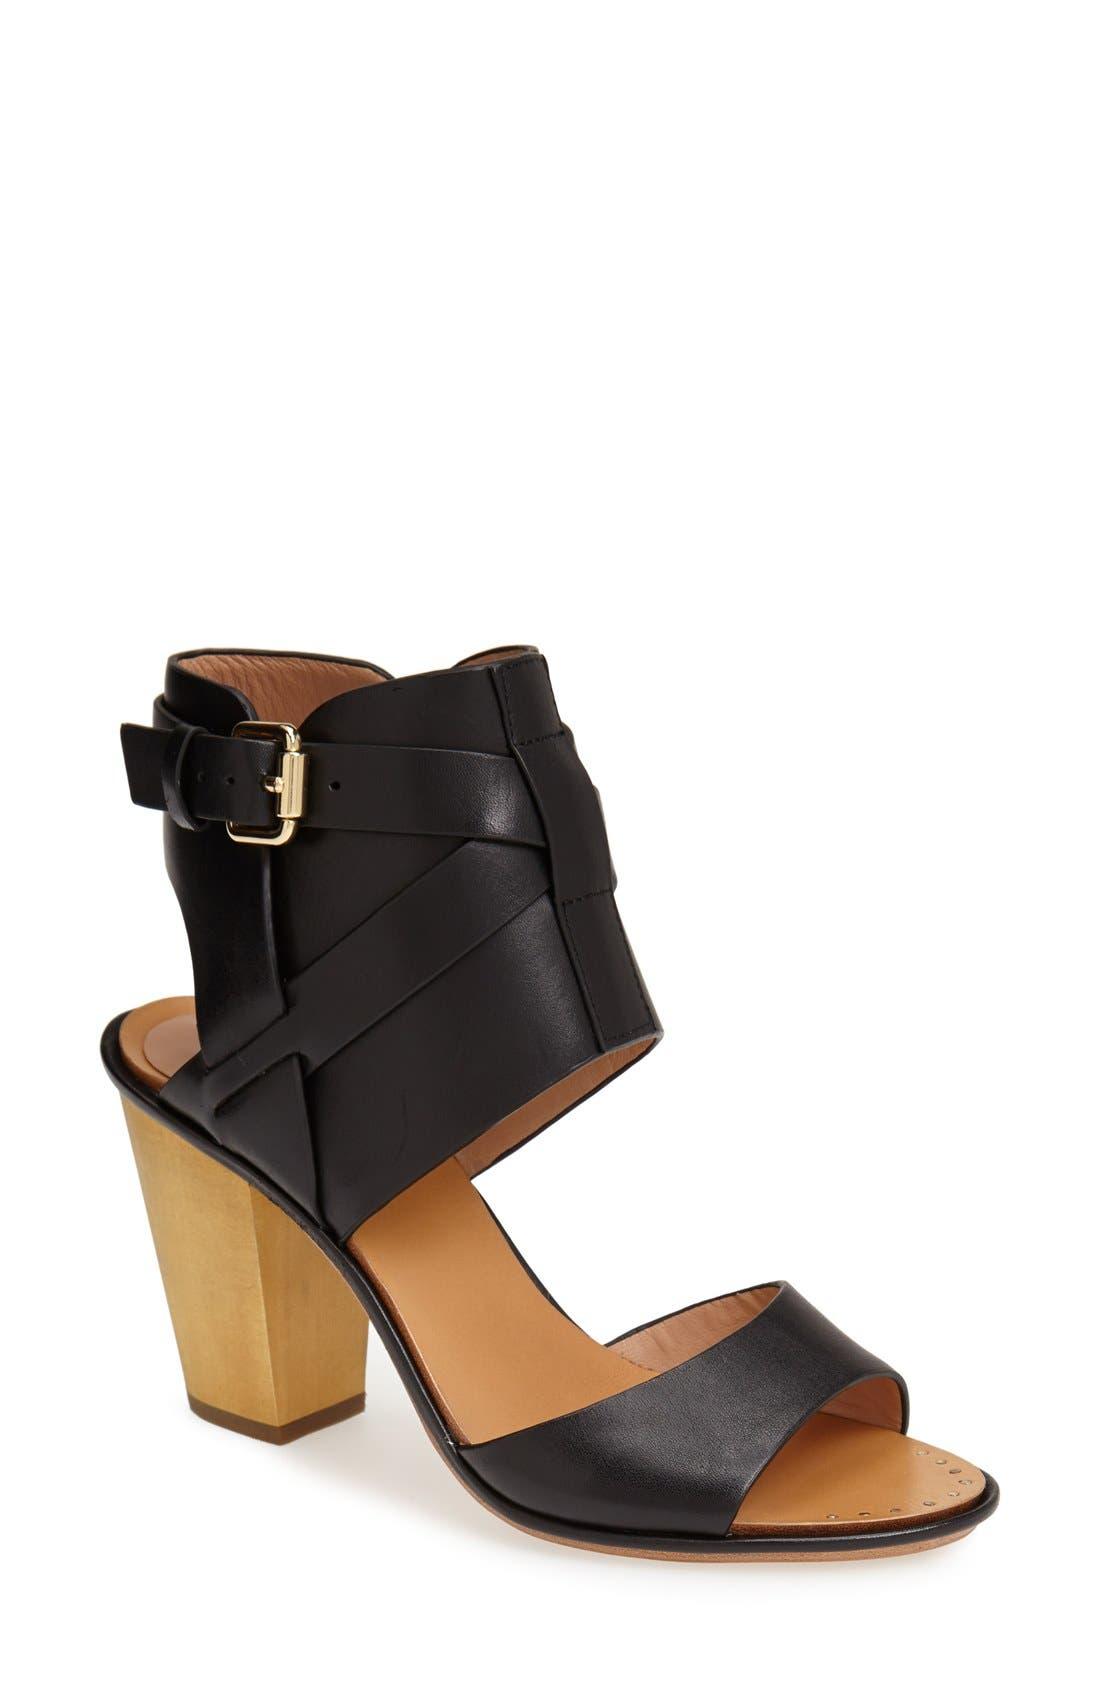 Main Image - VC Signature 'Okalini' Leather Sandal (Women)